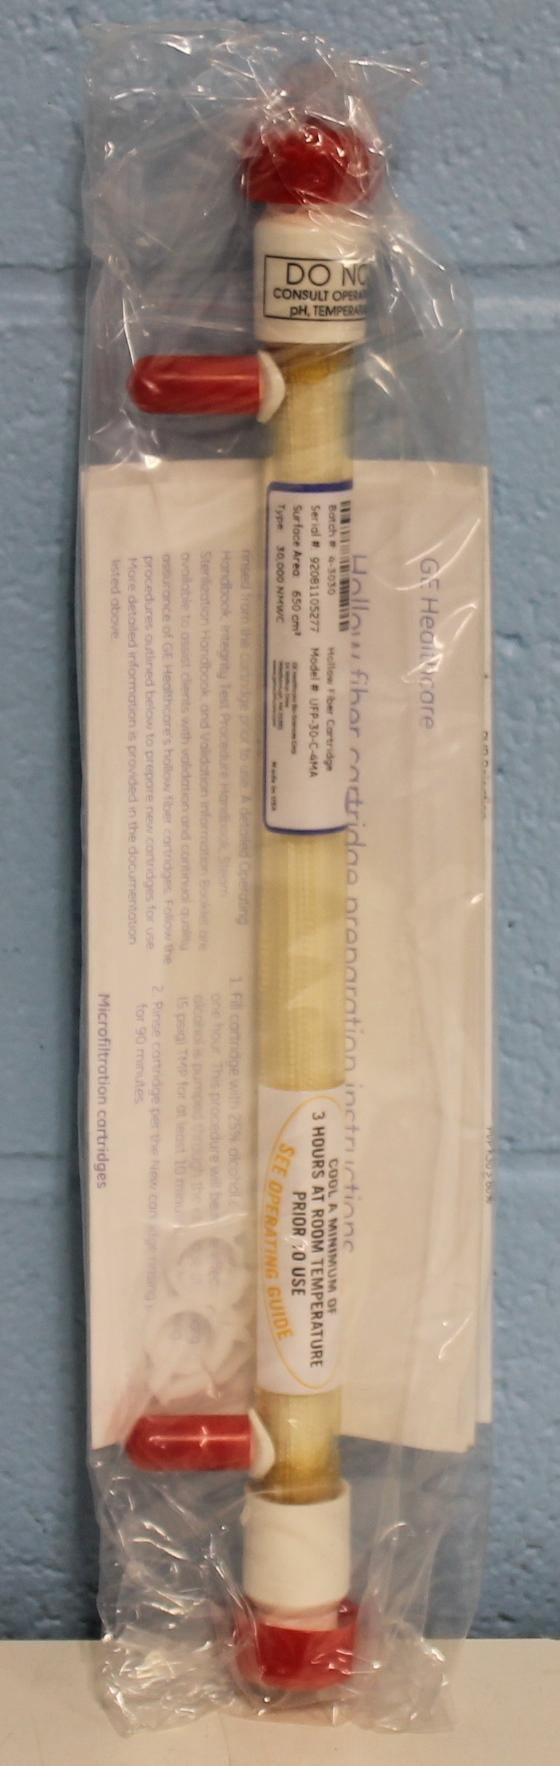 GE Healthcare Life Sciences 4MA Ultrafiltration Hollow Fiber Cartridge (36.7 cm L) Model UFP-30-C-4MA Image